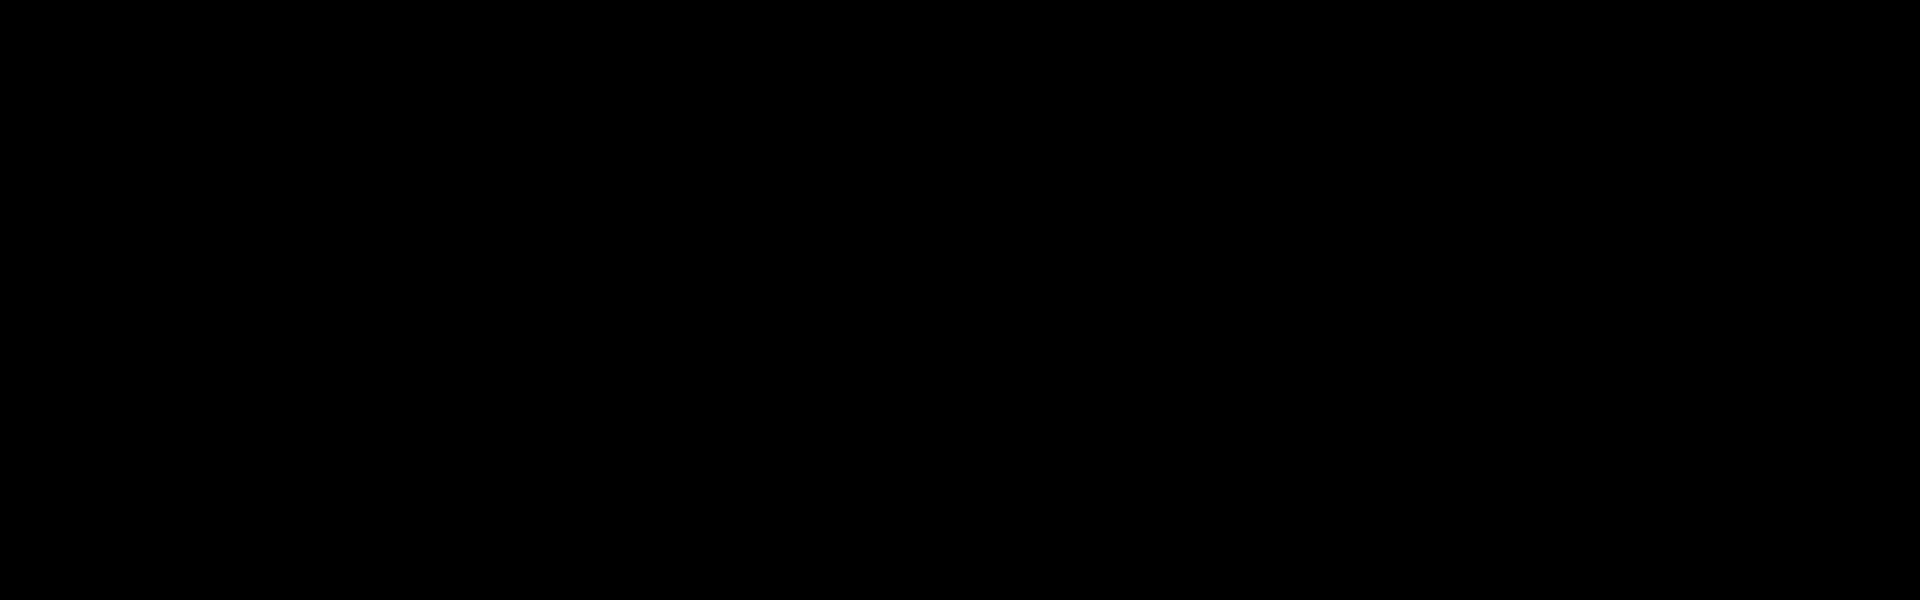 skypad6